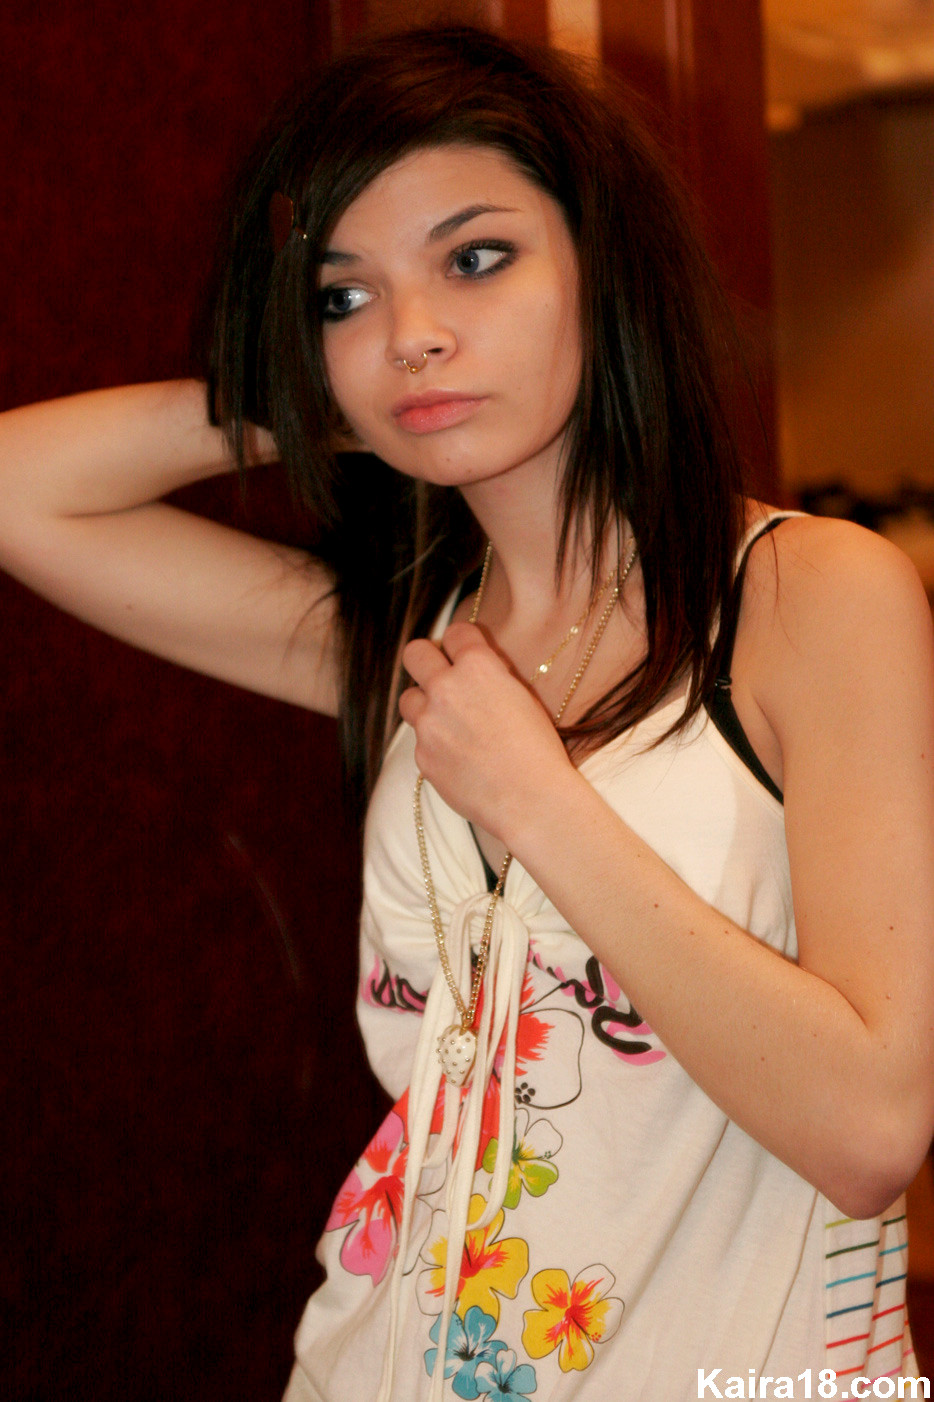 Cock nudists ukranian young nude sex